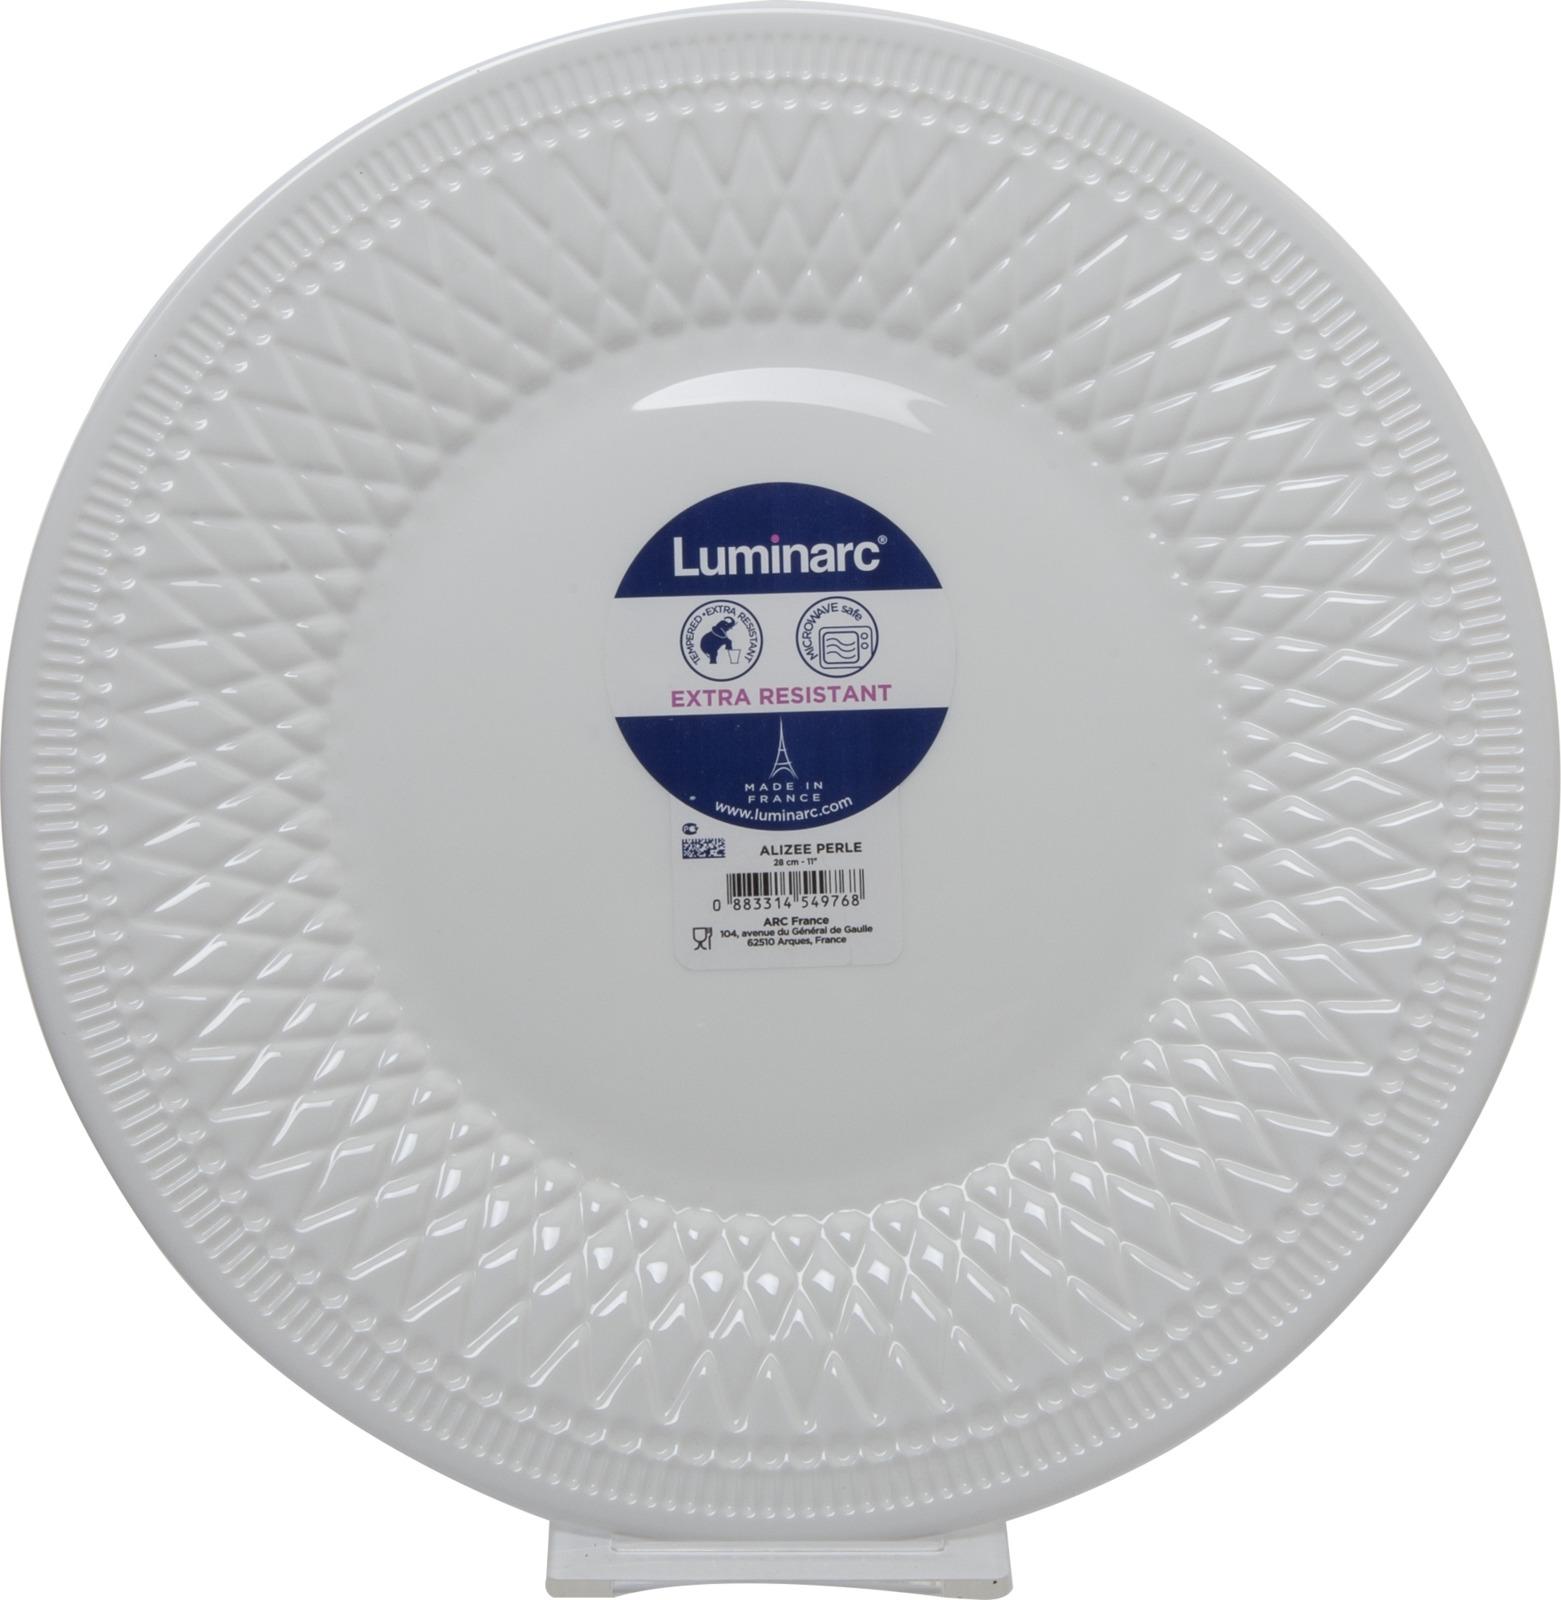 Тарелка Luminarc Ализе Перл, L4634, белый, диаметр 28 см тарелка десертная luminarcalizee диаметр 22 см